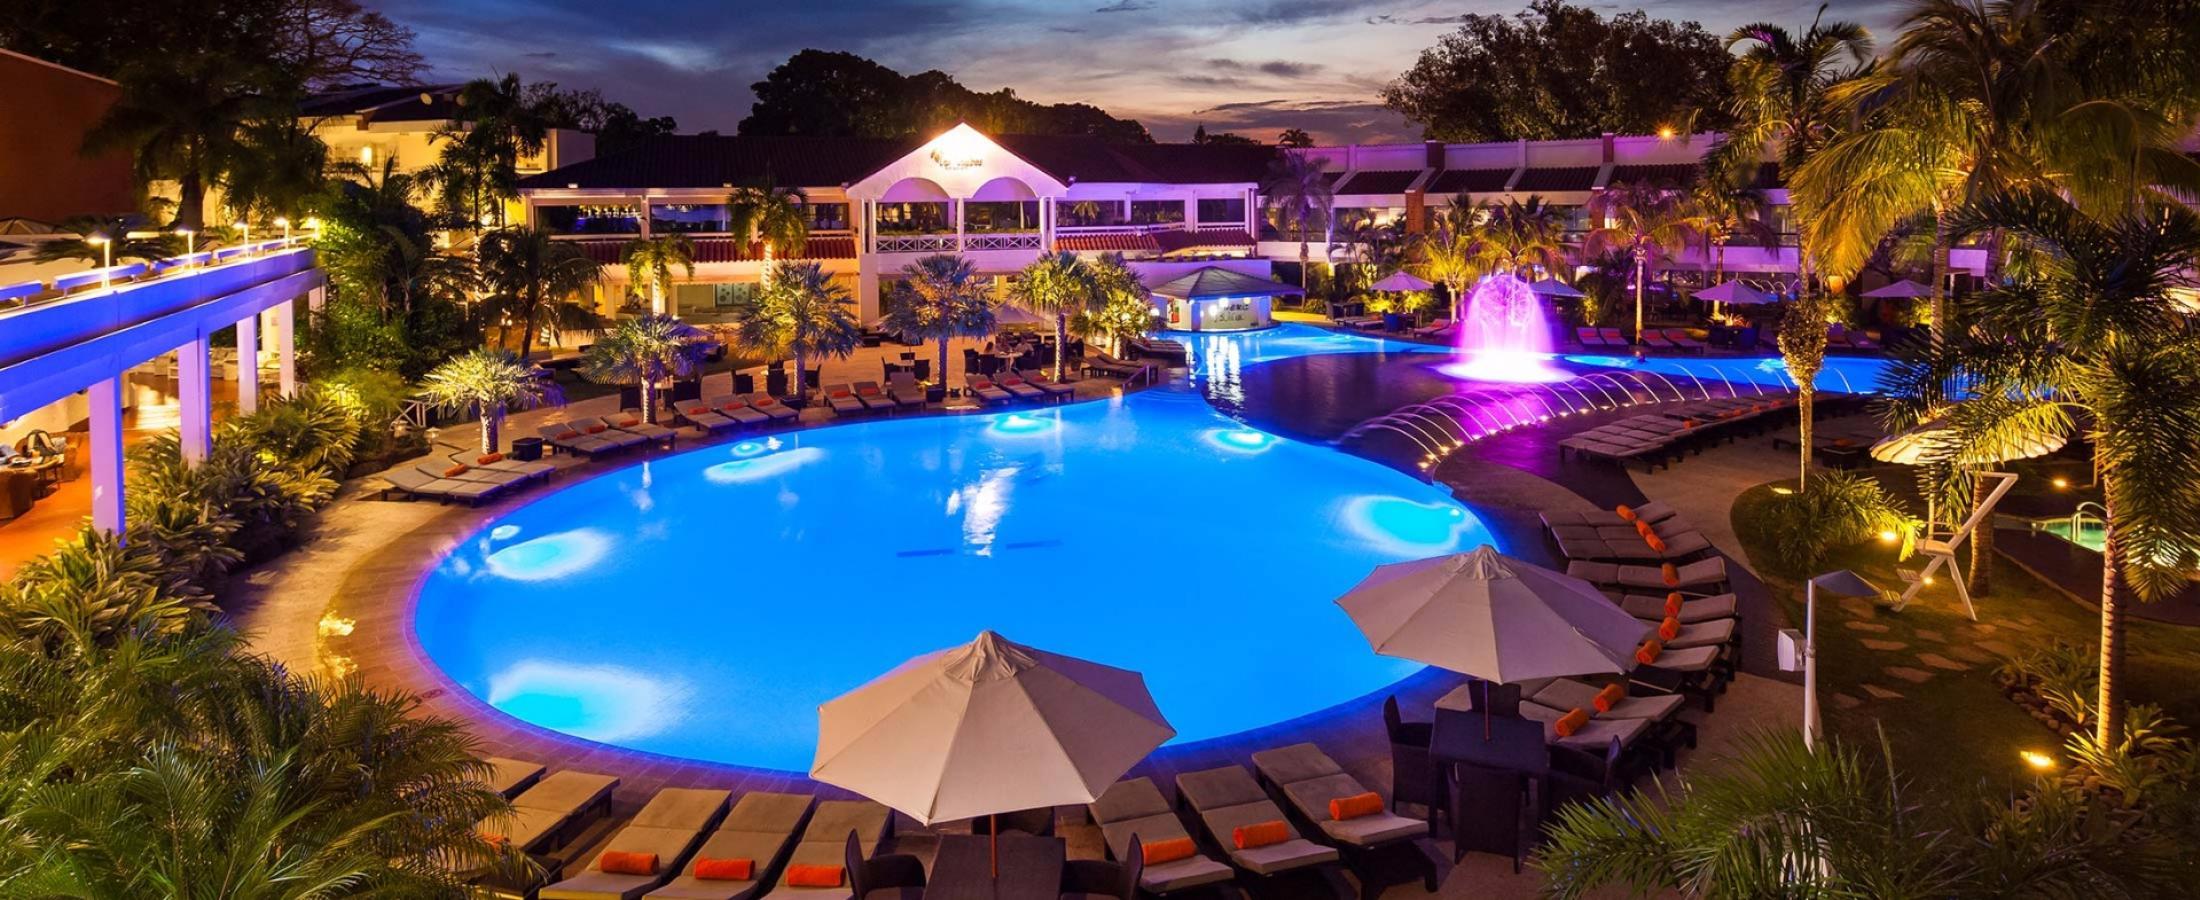 Los Tajibos Hotel